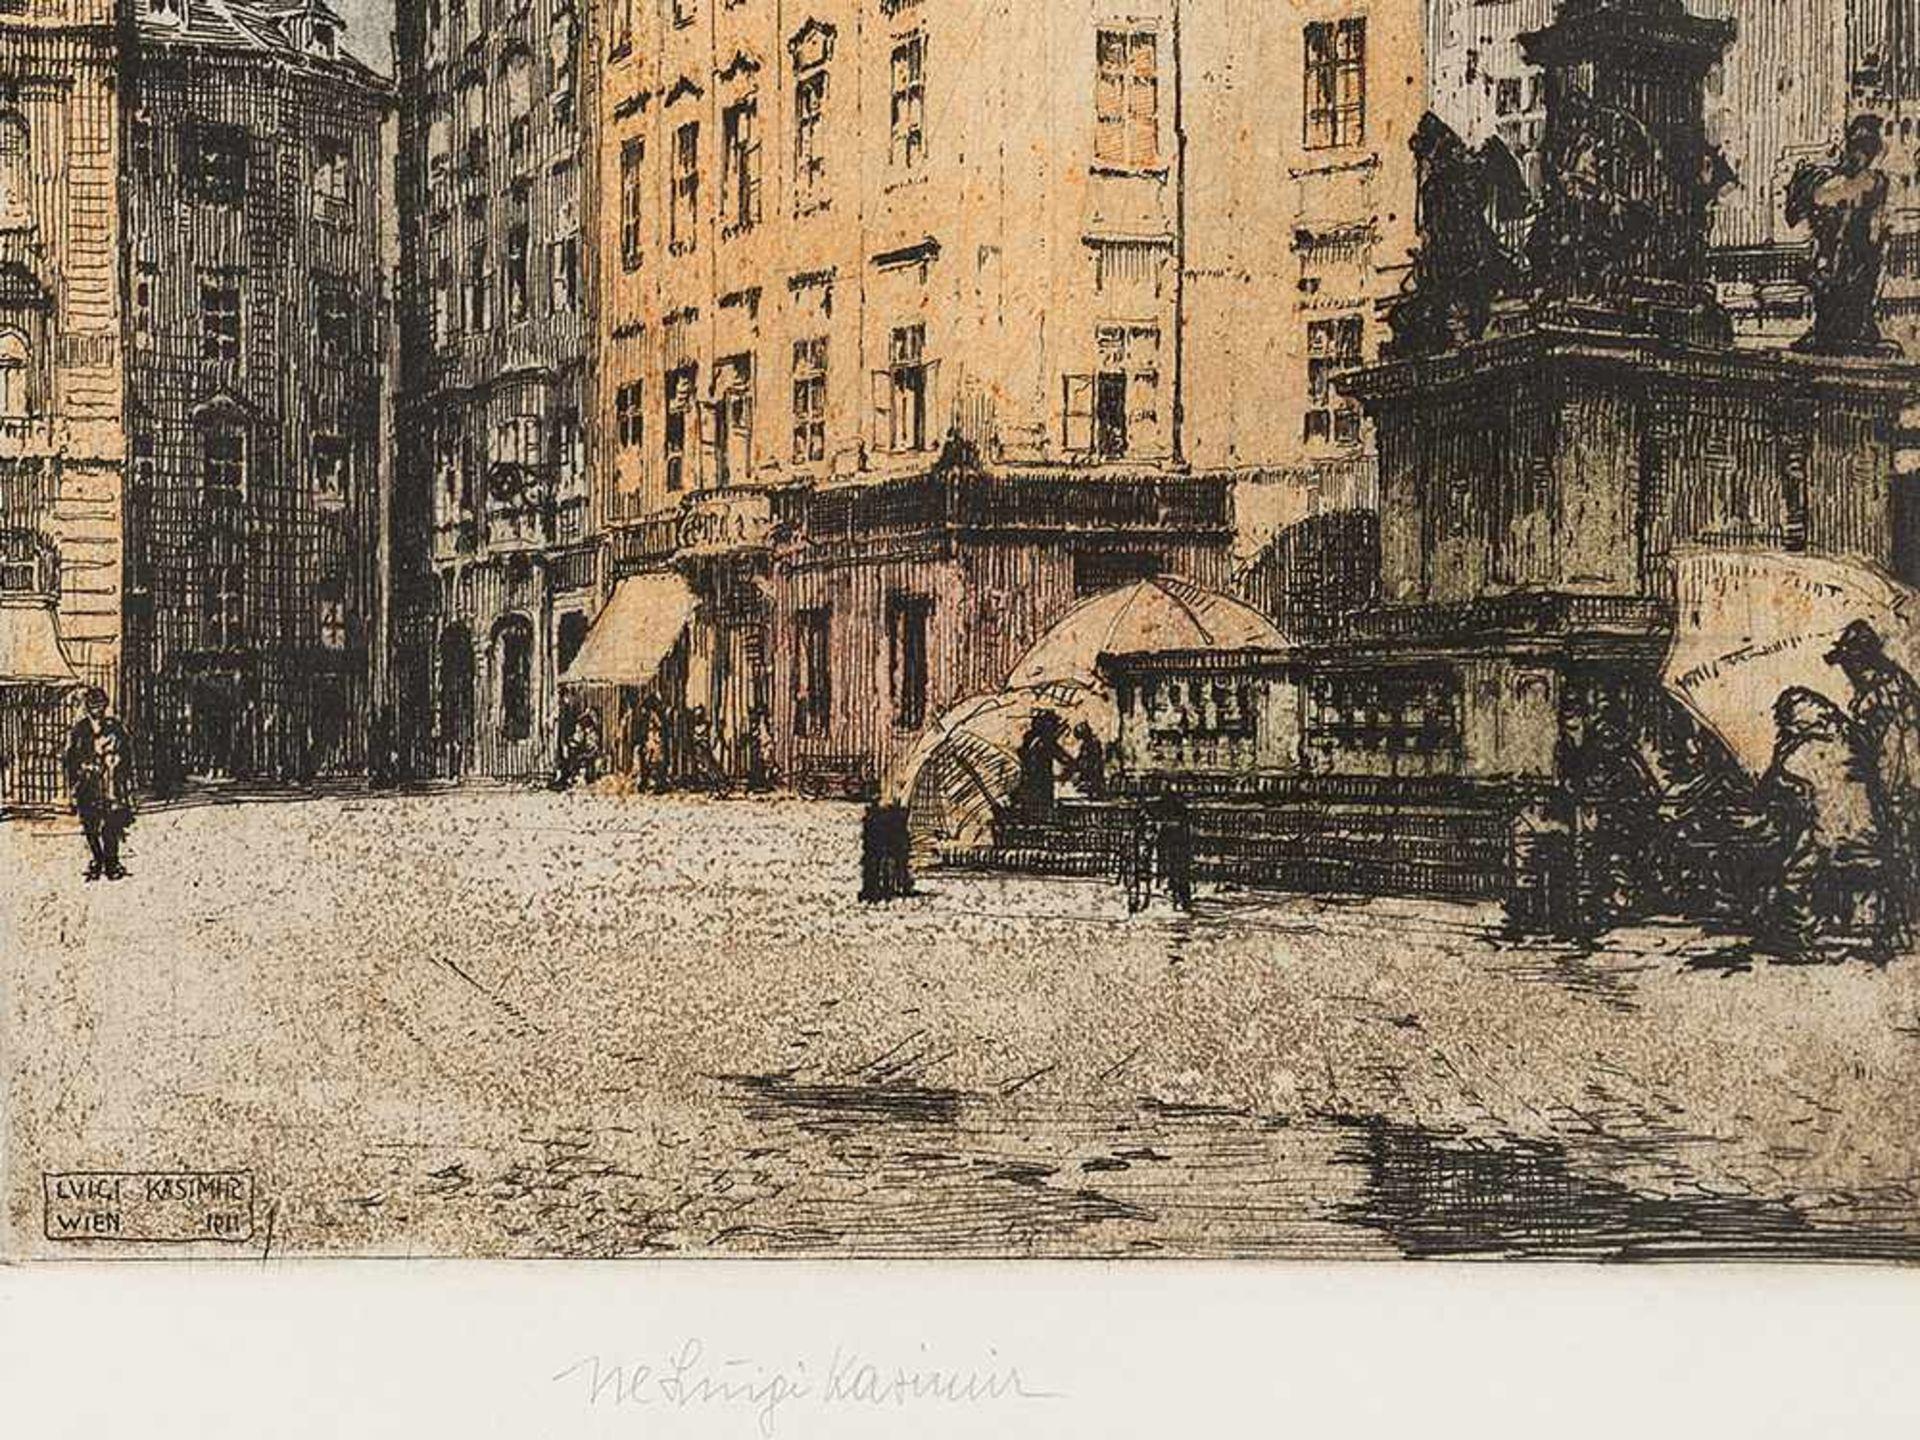 Los 73 - Luigi Kasimir, Mariensäule Am Hof, Farbradierung, Wien, 1911 Farbradierung auf Velin. Luigi